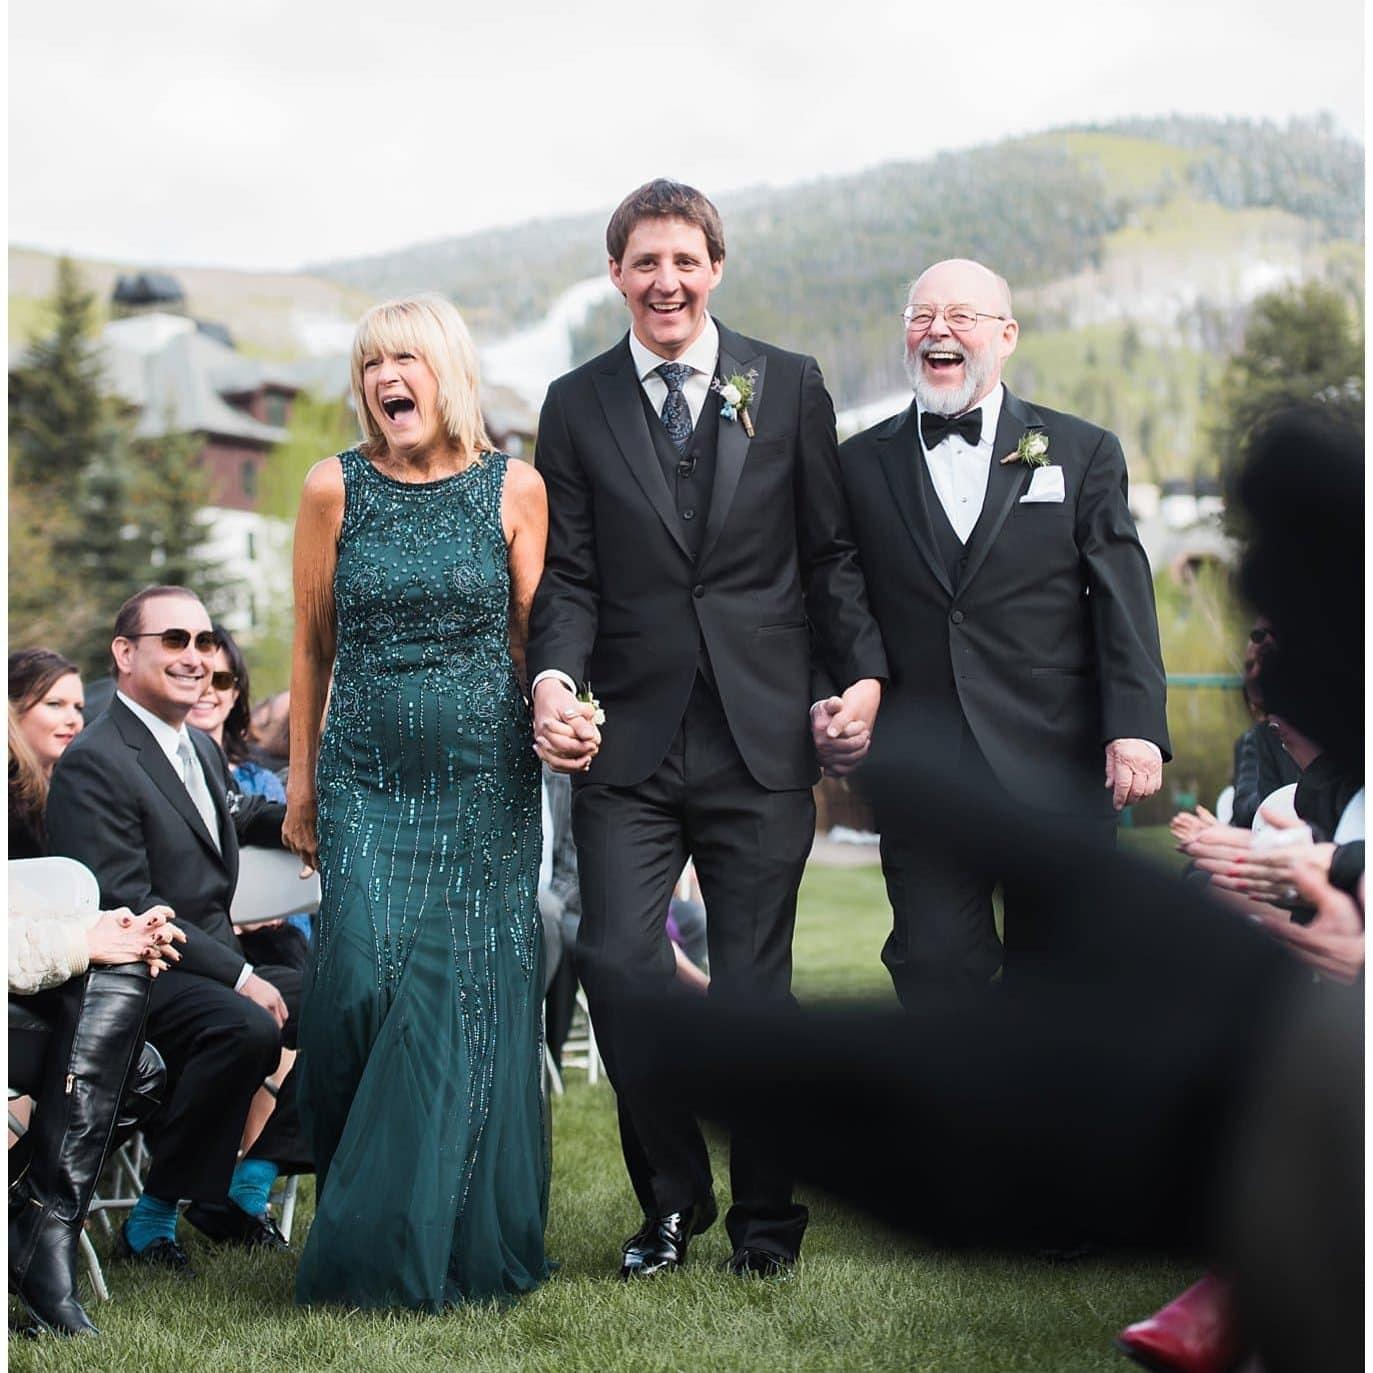 Park Hyatt Beaver Creek wedding photo